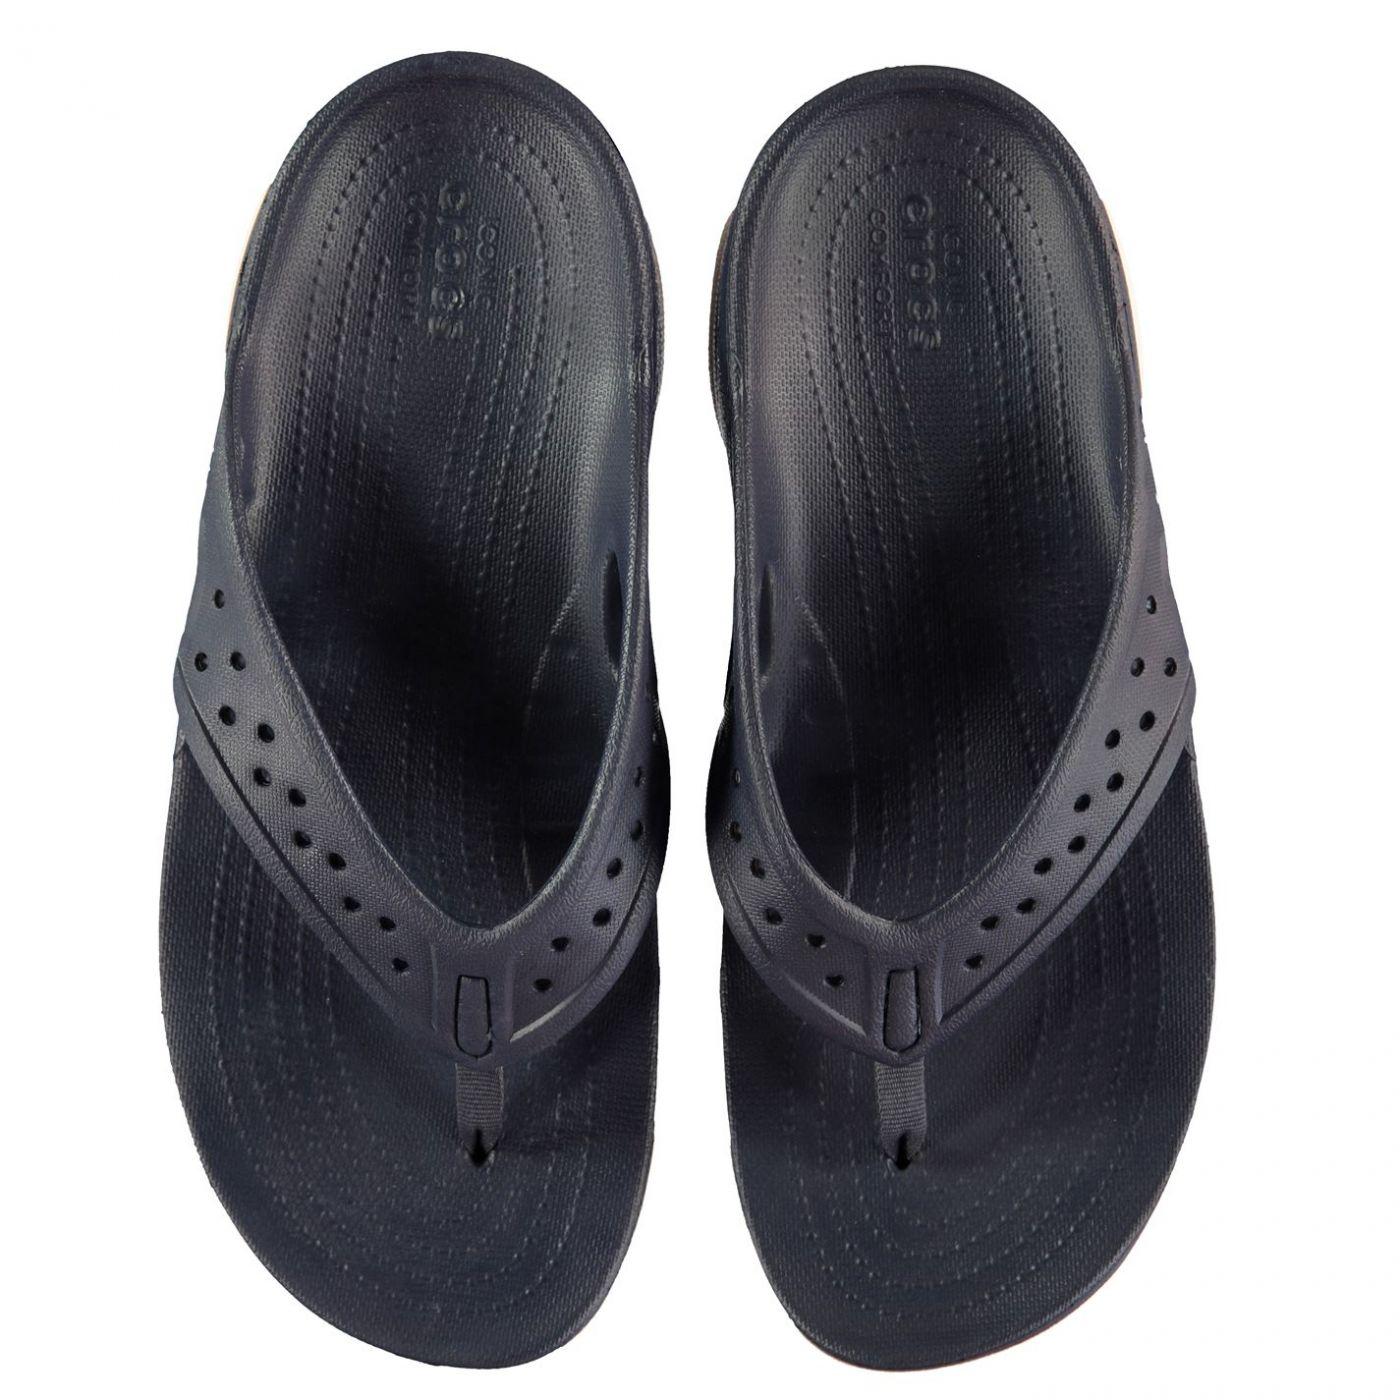 Crocs Swift Deck Flip Flops Mens